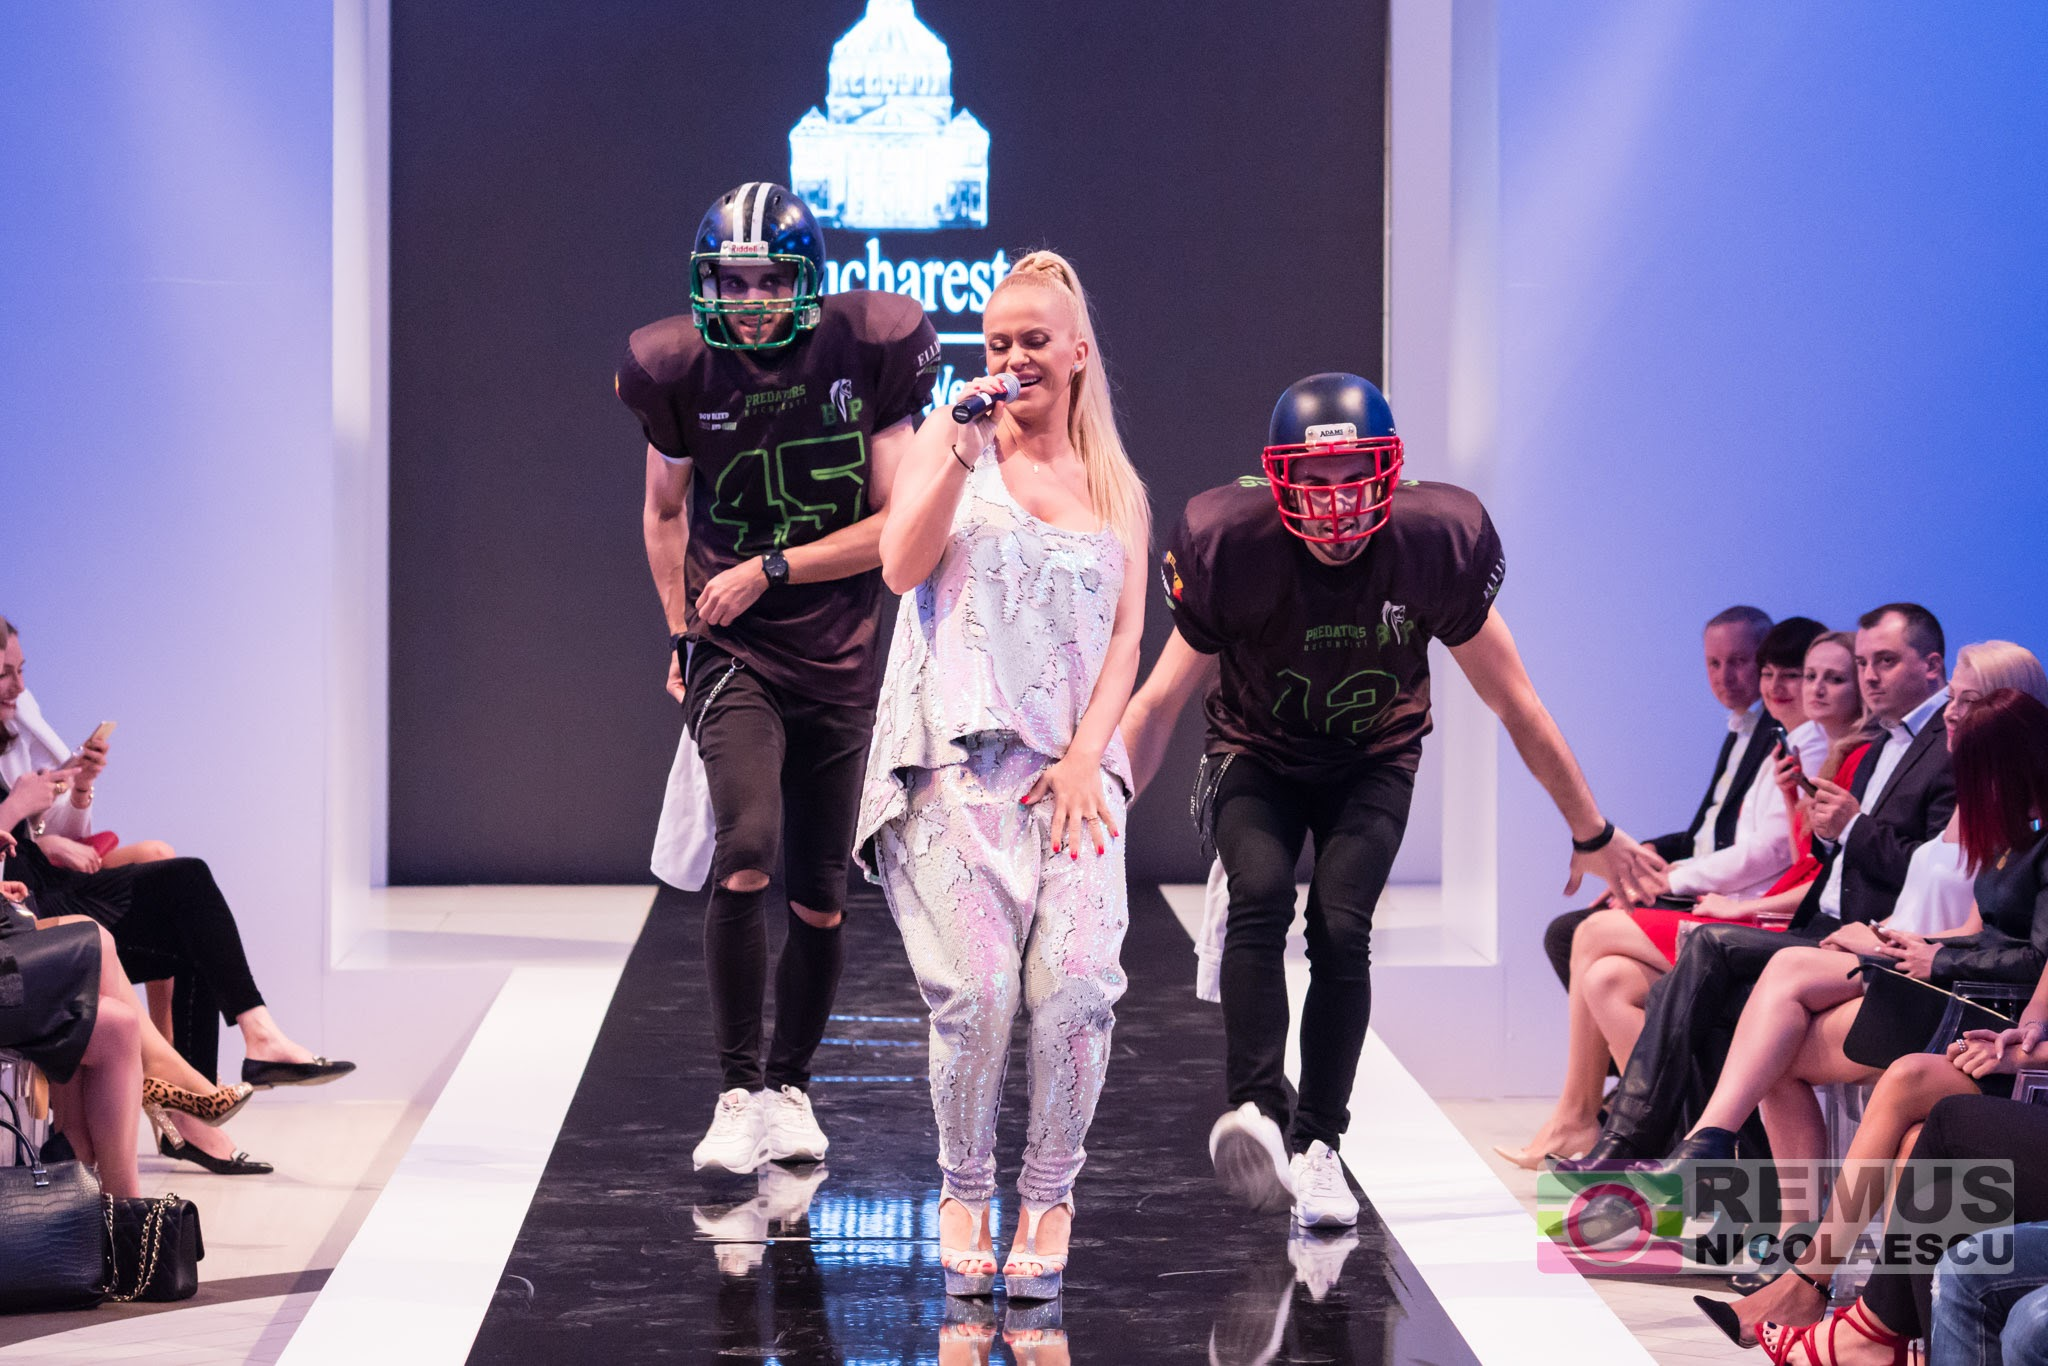 Anda Adam a făcut show la Bucharest Fashion Week!